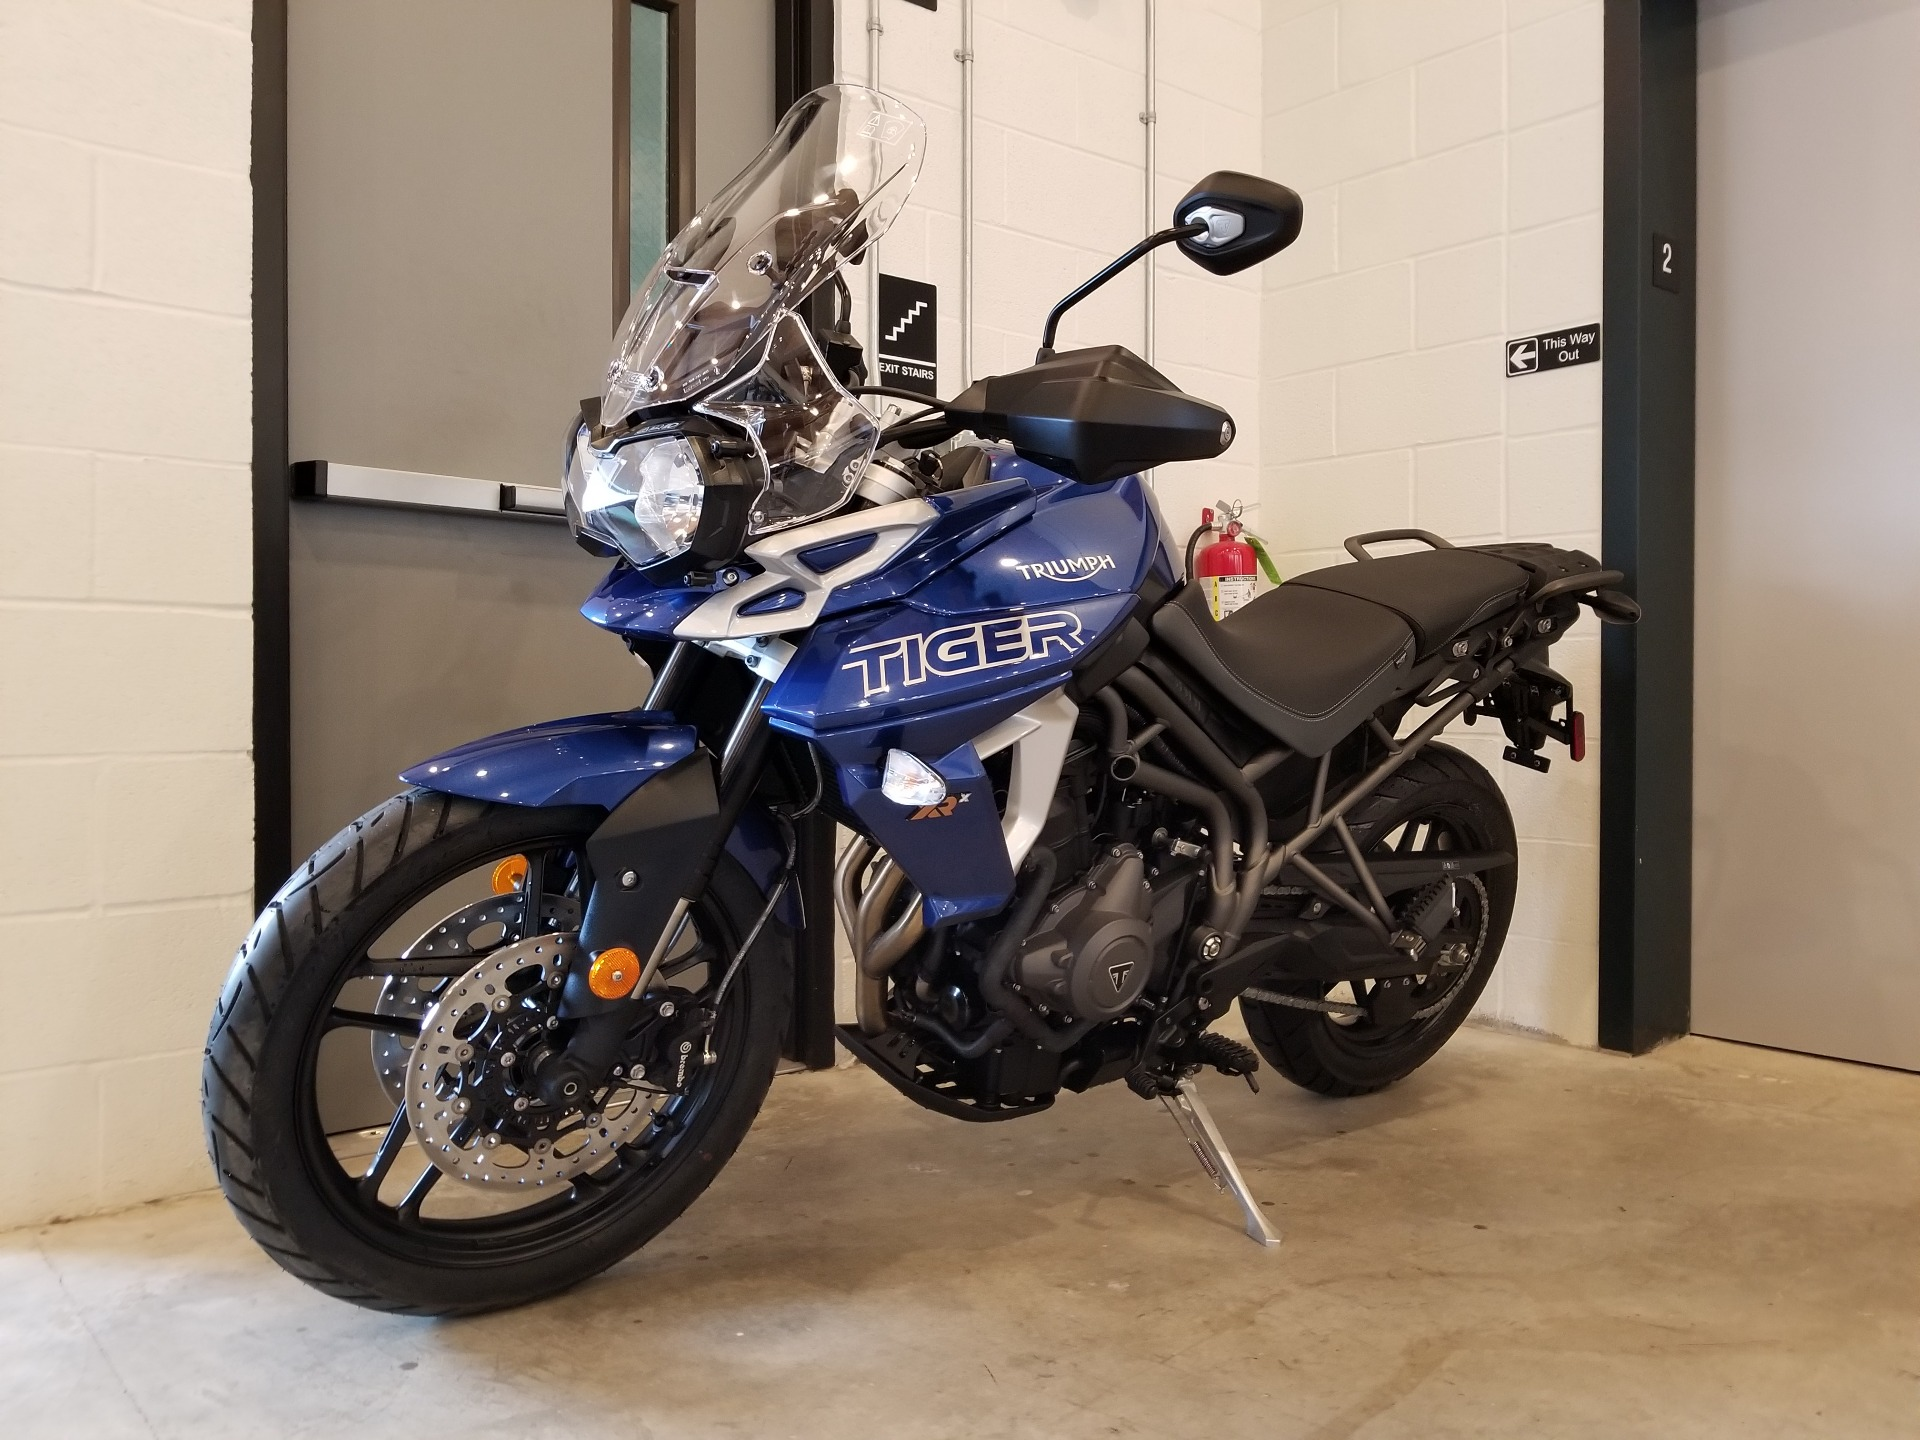 2019 Triumph Tiger 800 Xrx Motorcycles Port Clinton Pennsylvania